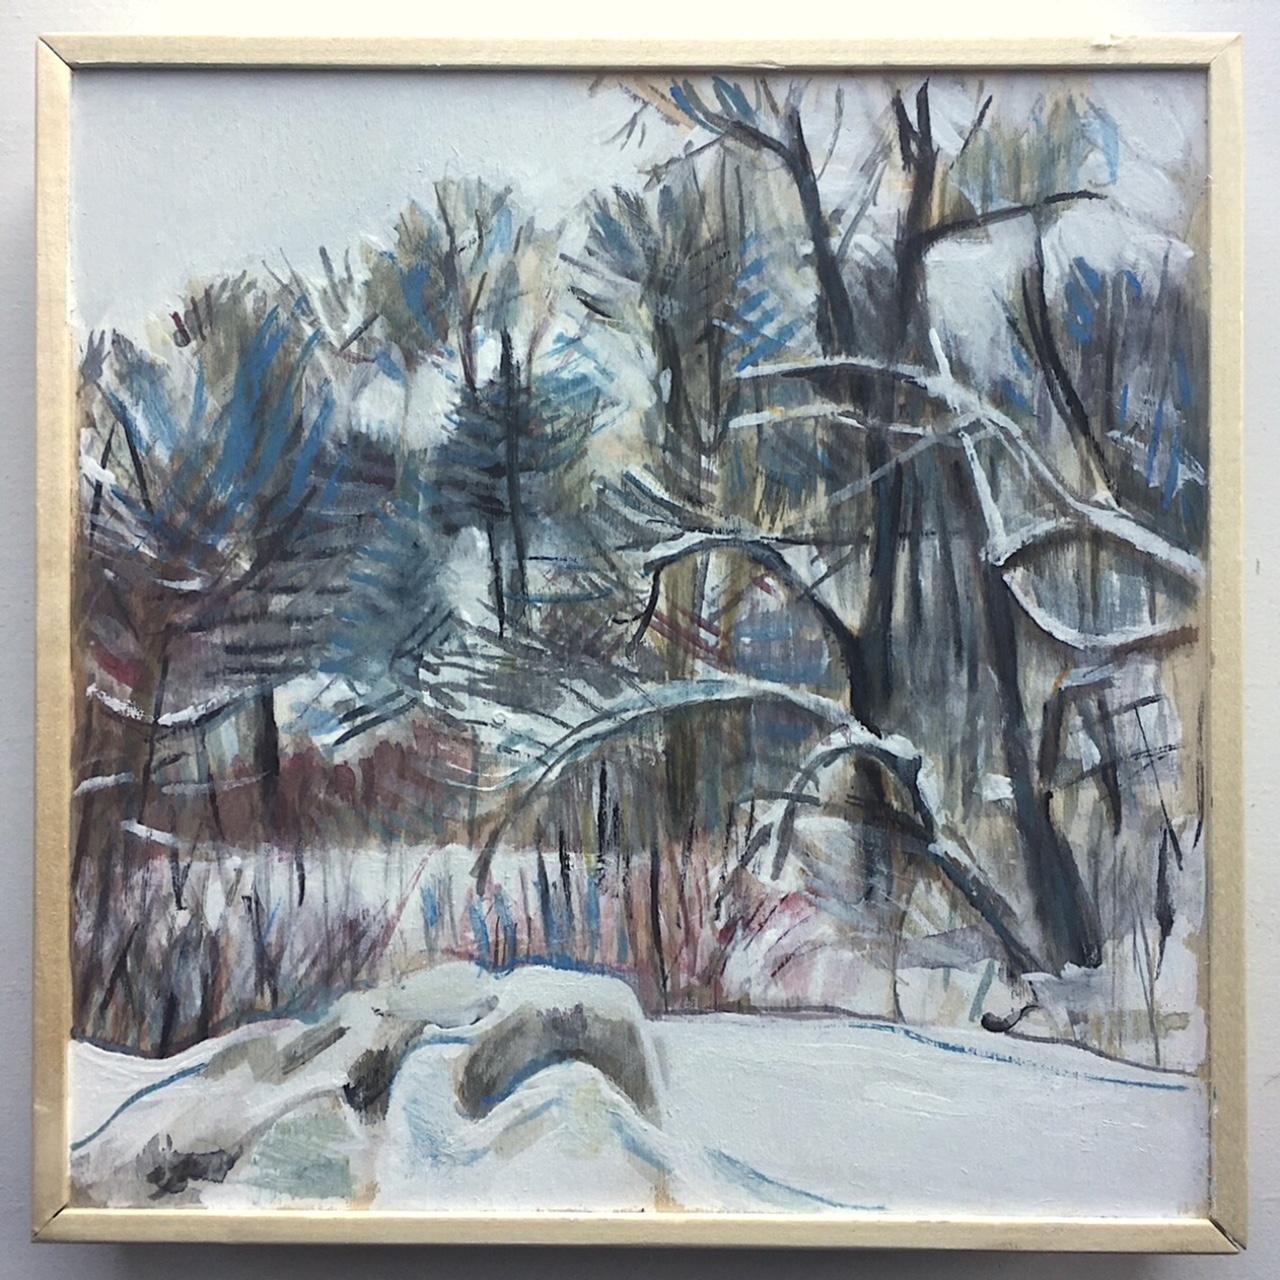 "March, 8"" x 8"", Gouache on birch board"